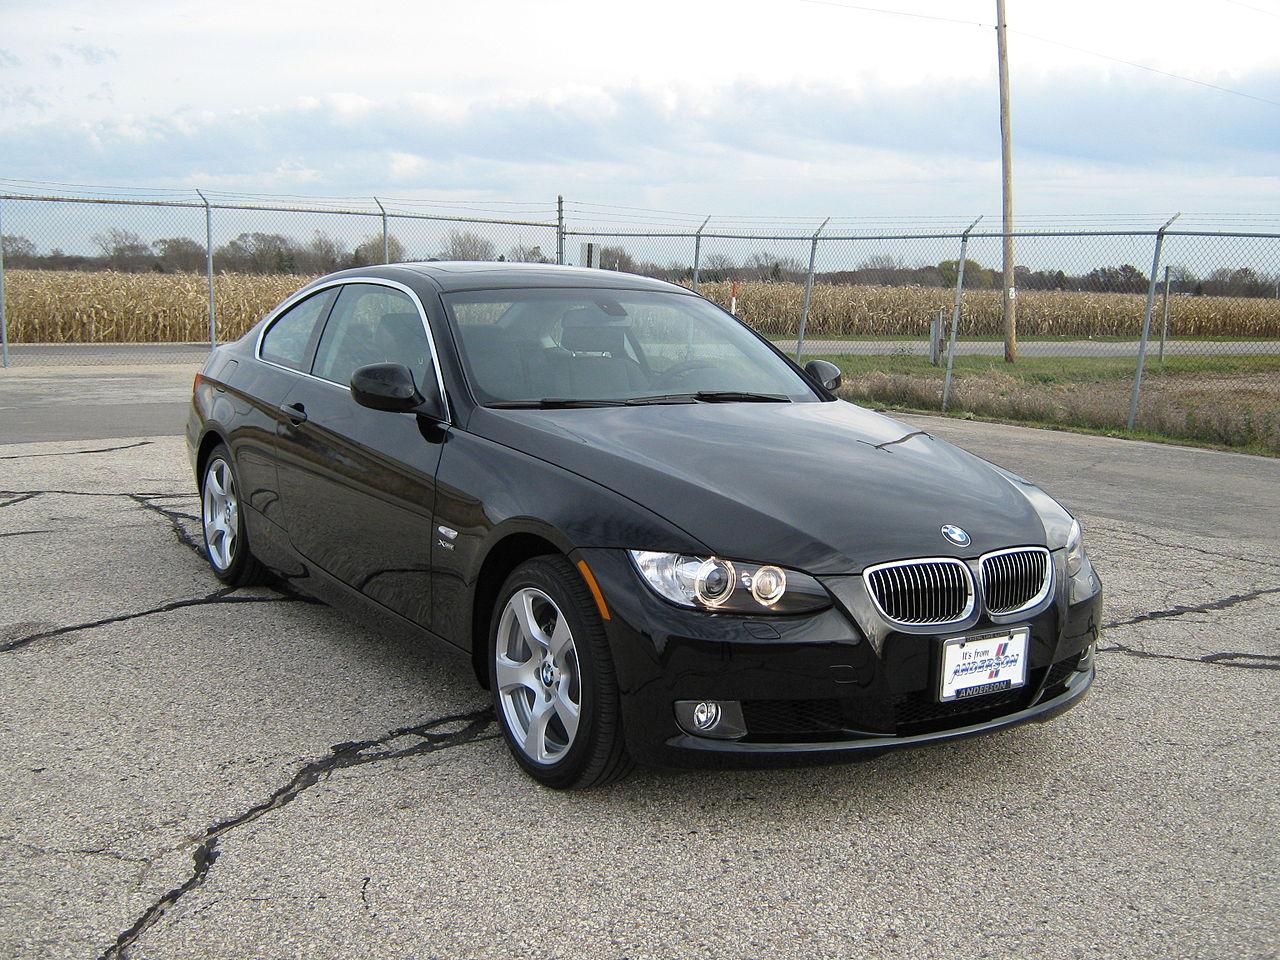 Mb S Coupe >> File:2010 BMW 328i coupe -- NHTSA 01.jpg - Wikimedia Commons